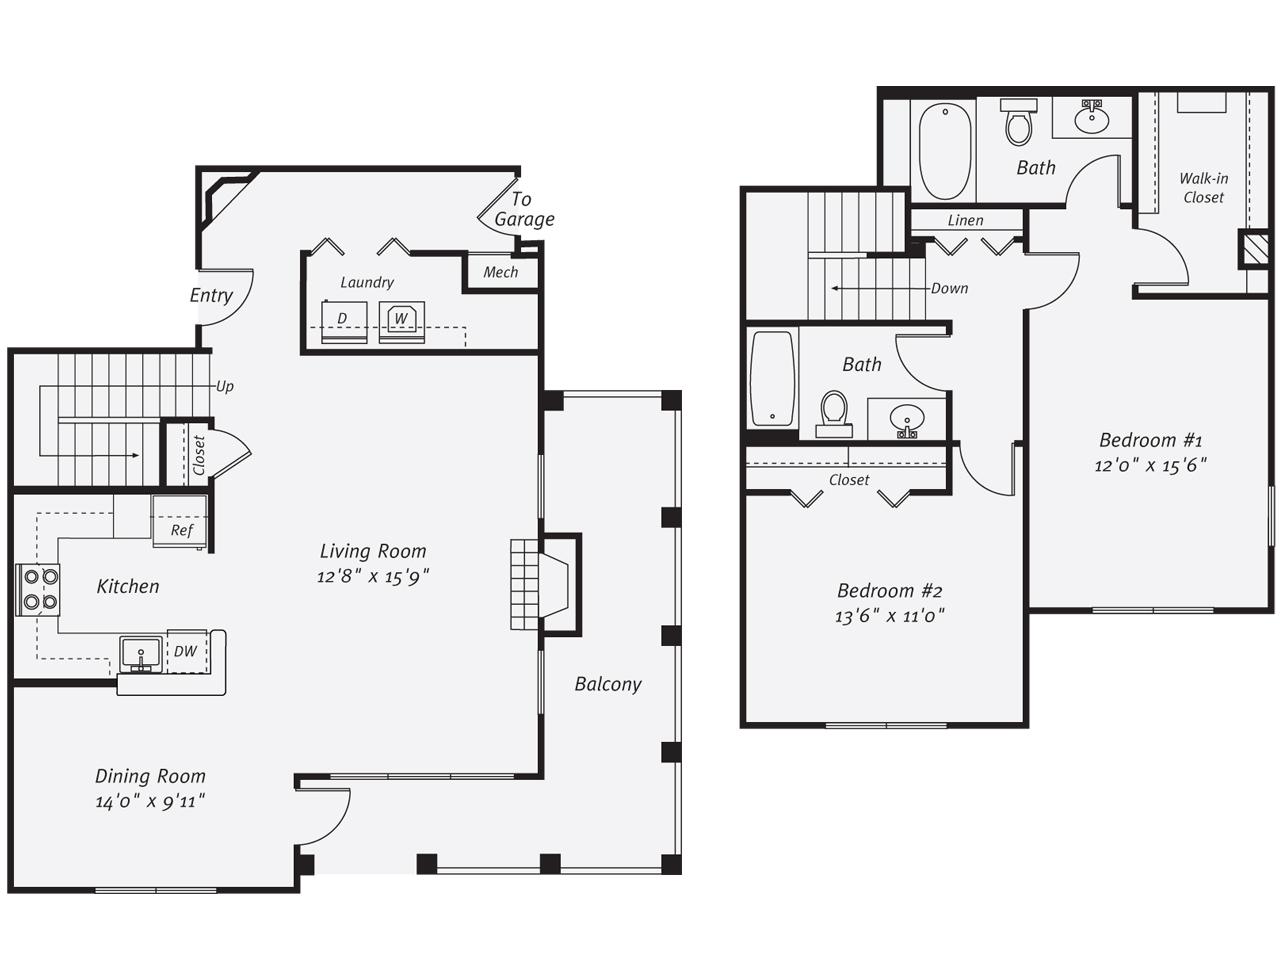 Ny coram thepointatpineridge p0571769 ny014 bt11g 2 floorplan